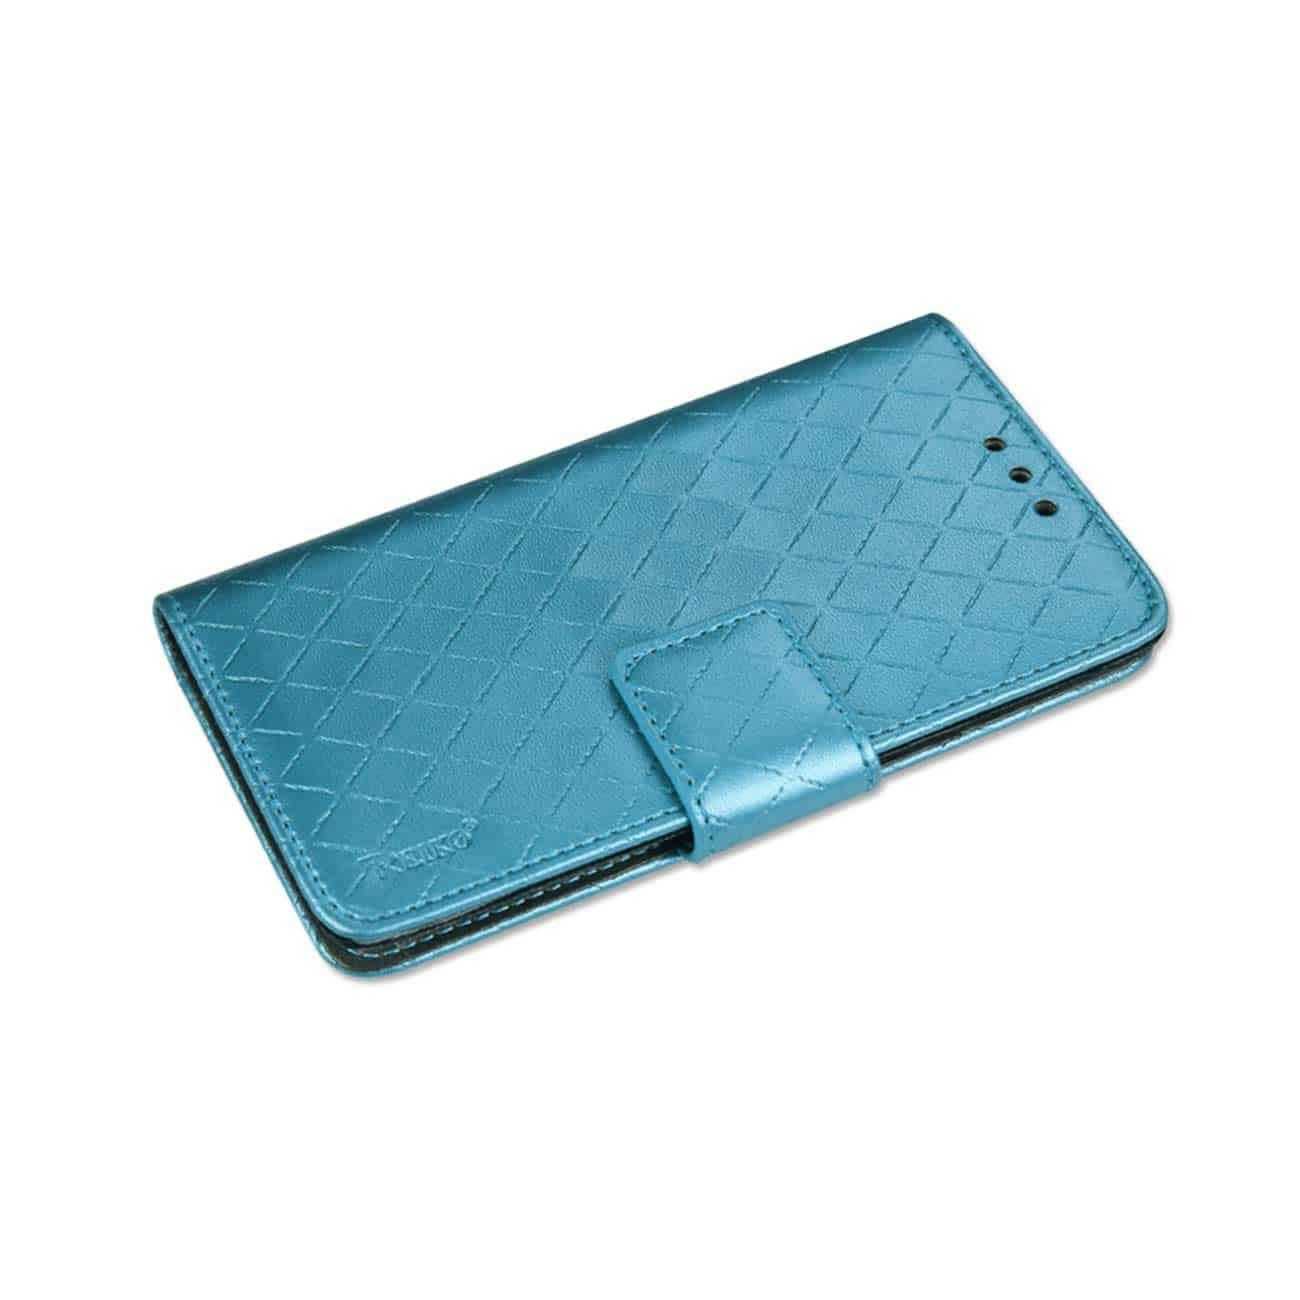 SAMSUNG GALAXY S6 RHOMBUS WALLET CASE IN BLUE